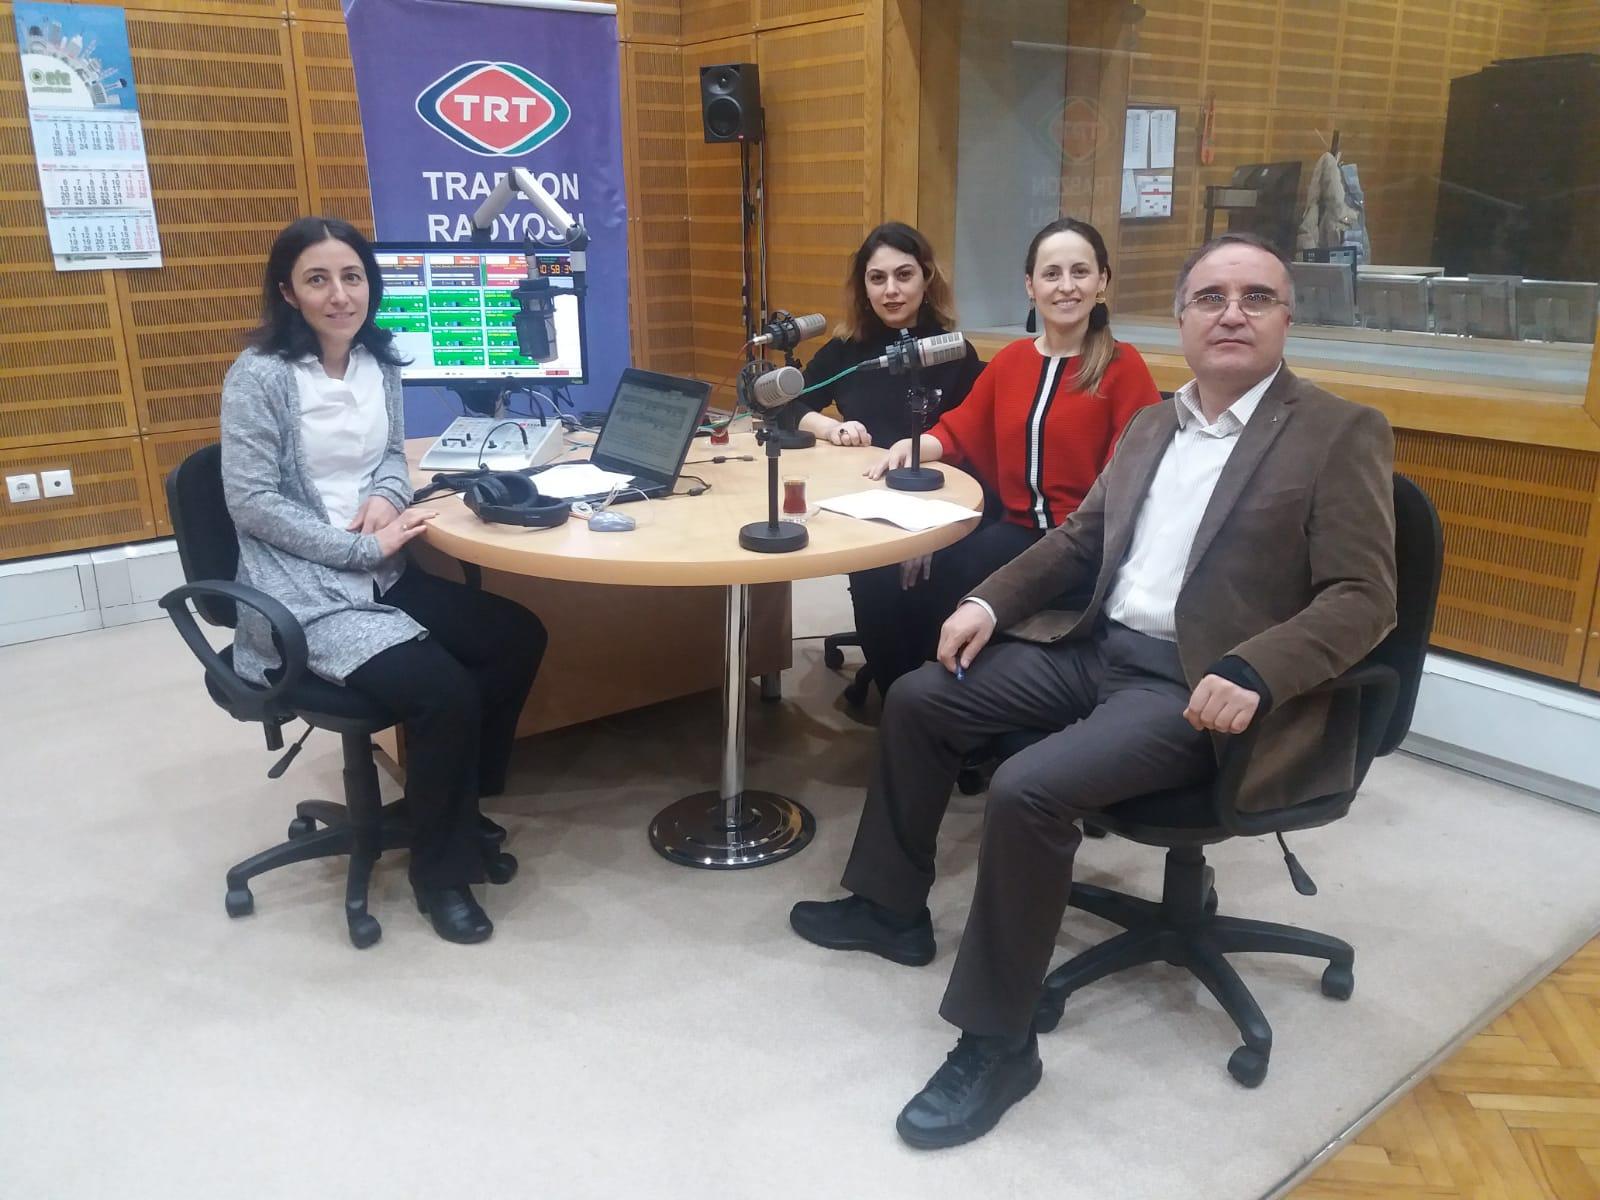 TRÜ-SEM TRT Trabzon Radyosunda